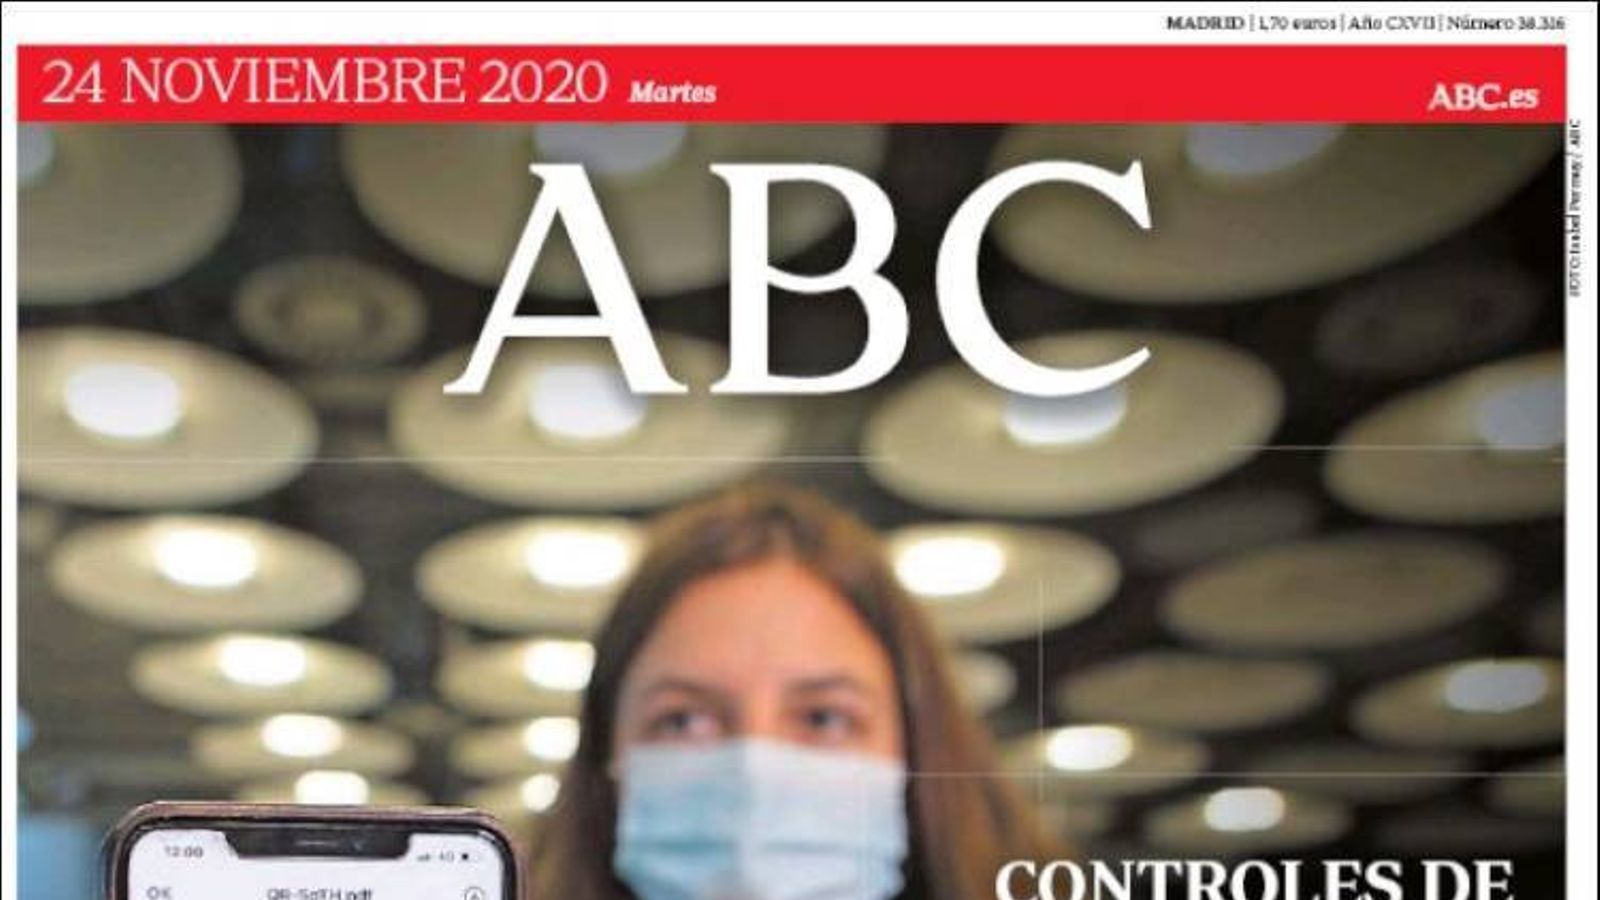 Portada 24 novembre 2020 ABC